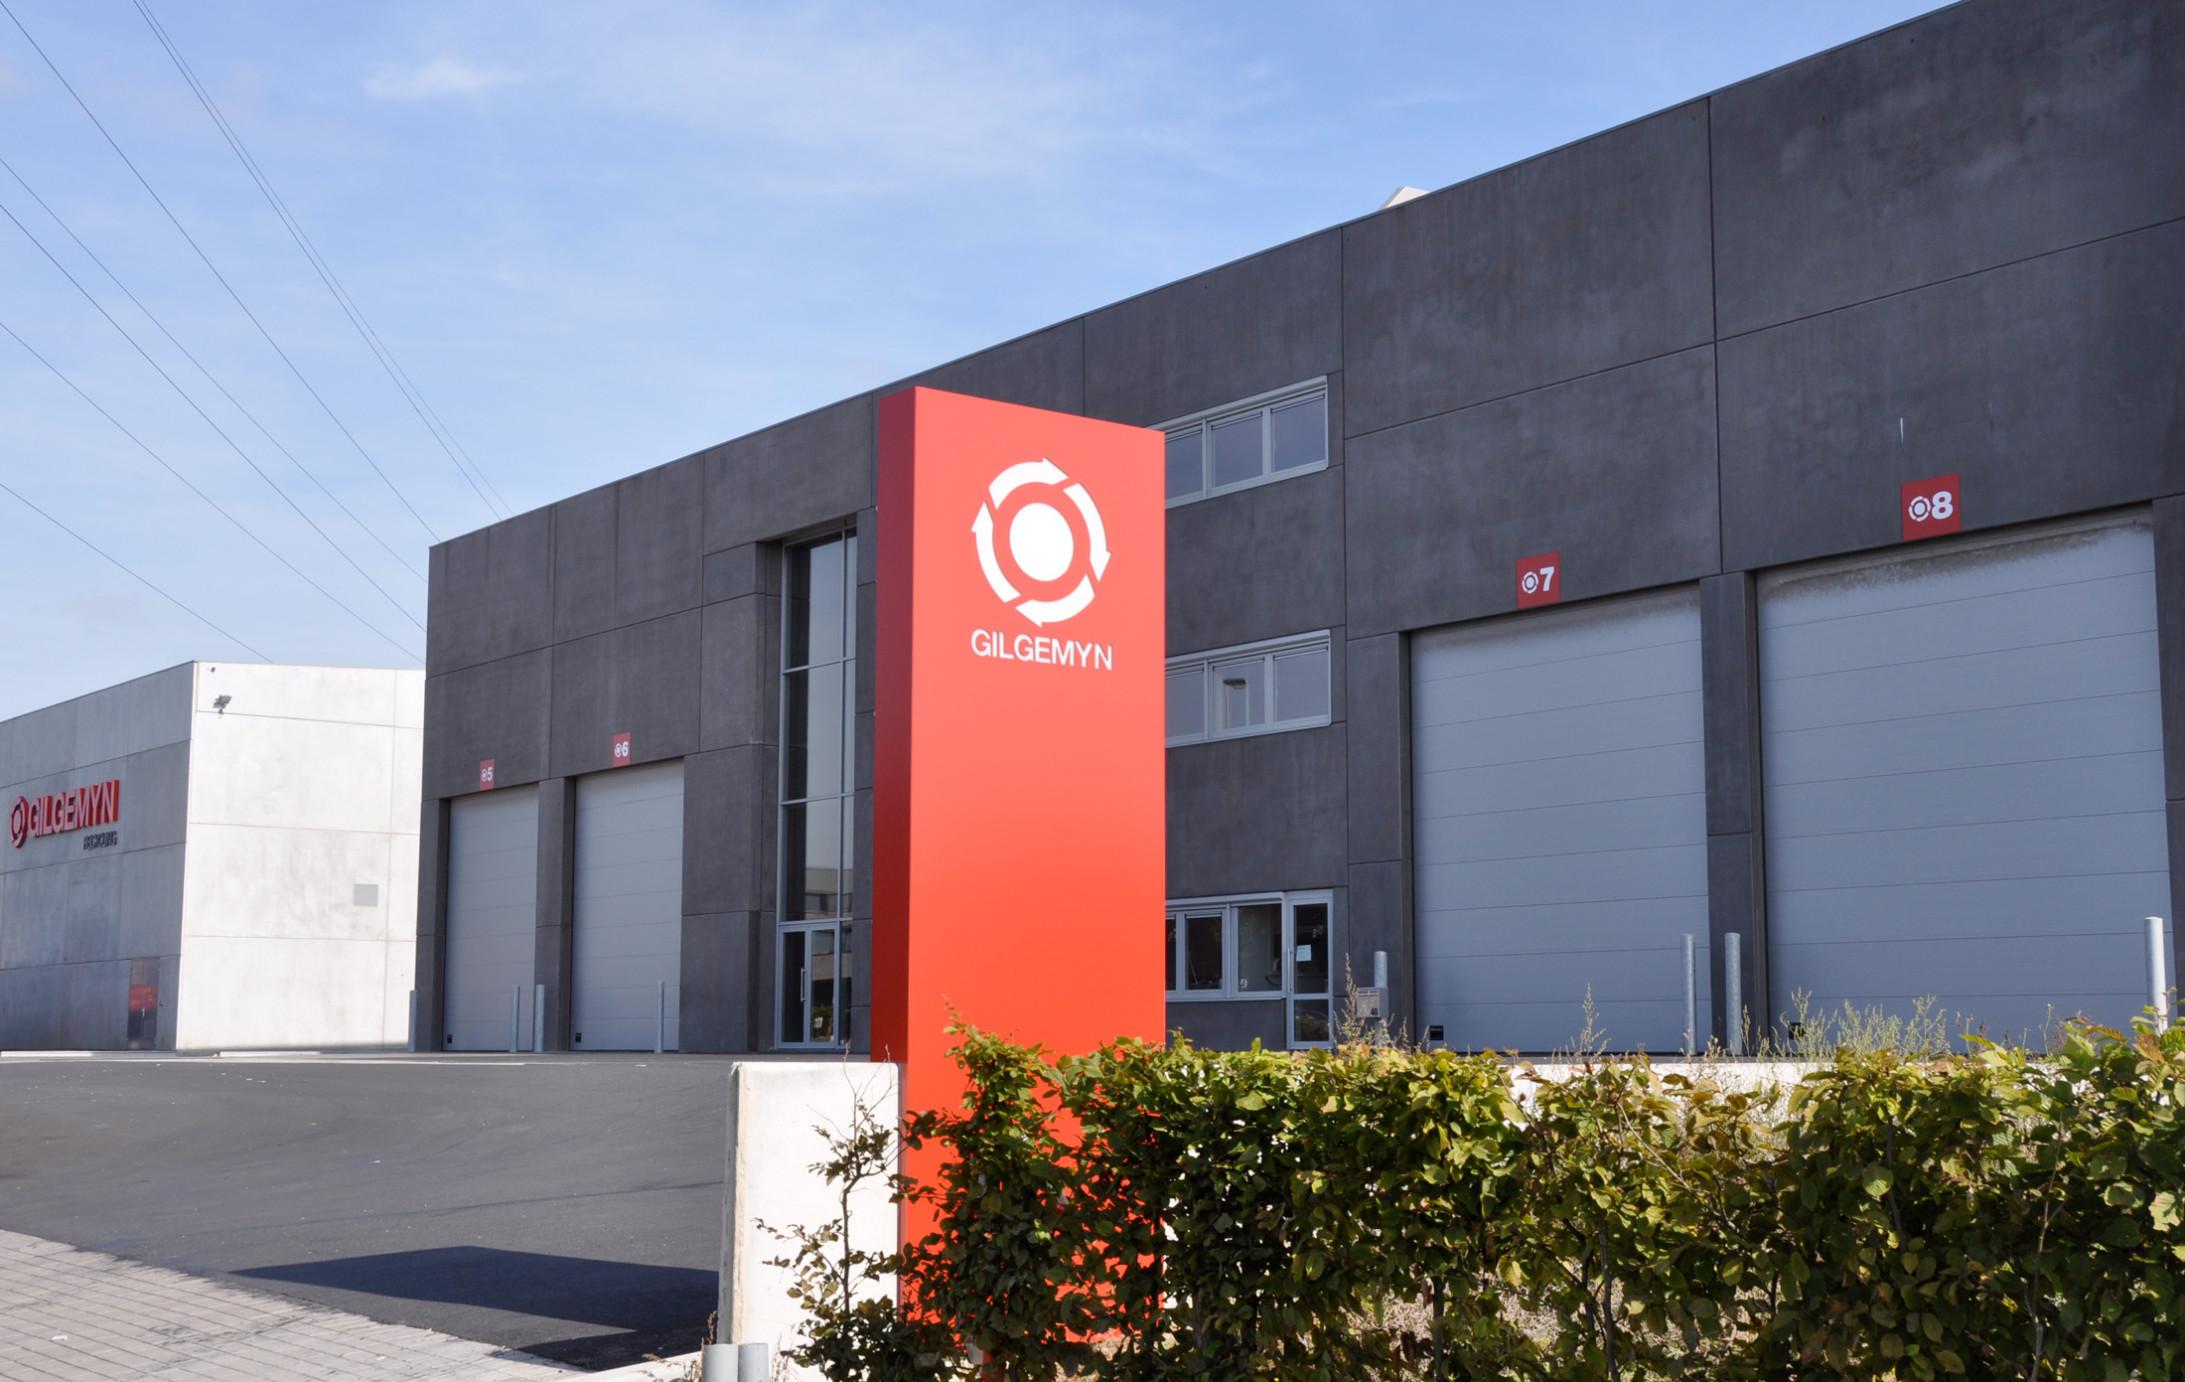 Bedrijfsgebouw Gilgemyn2_Gullegem_Claeys Architecten.jpg